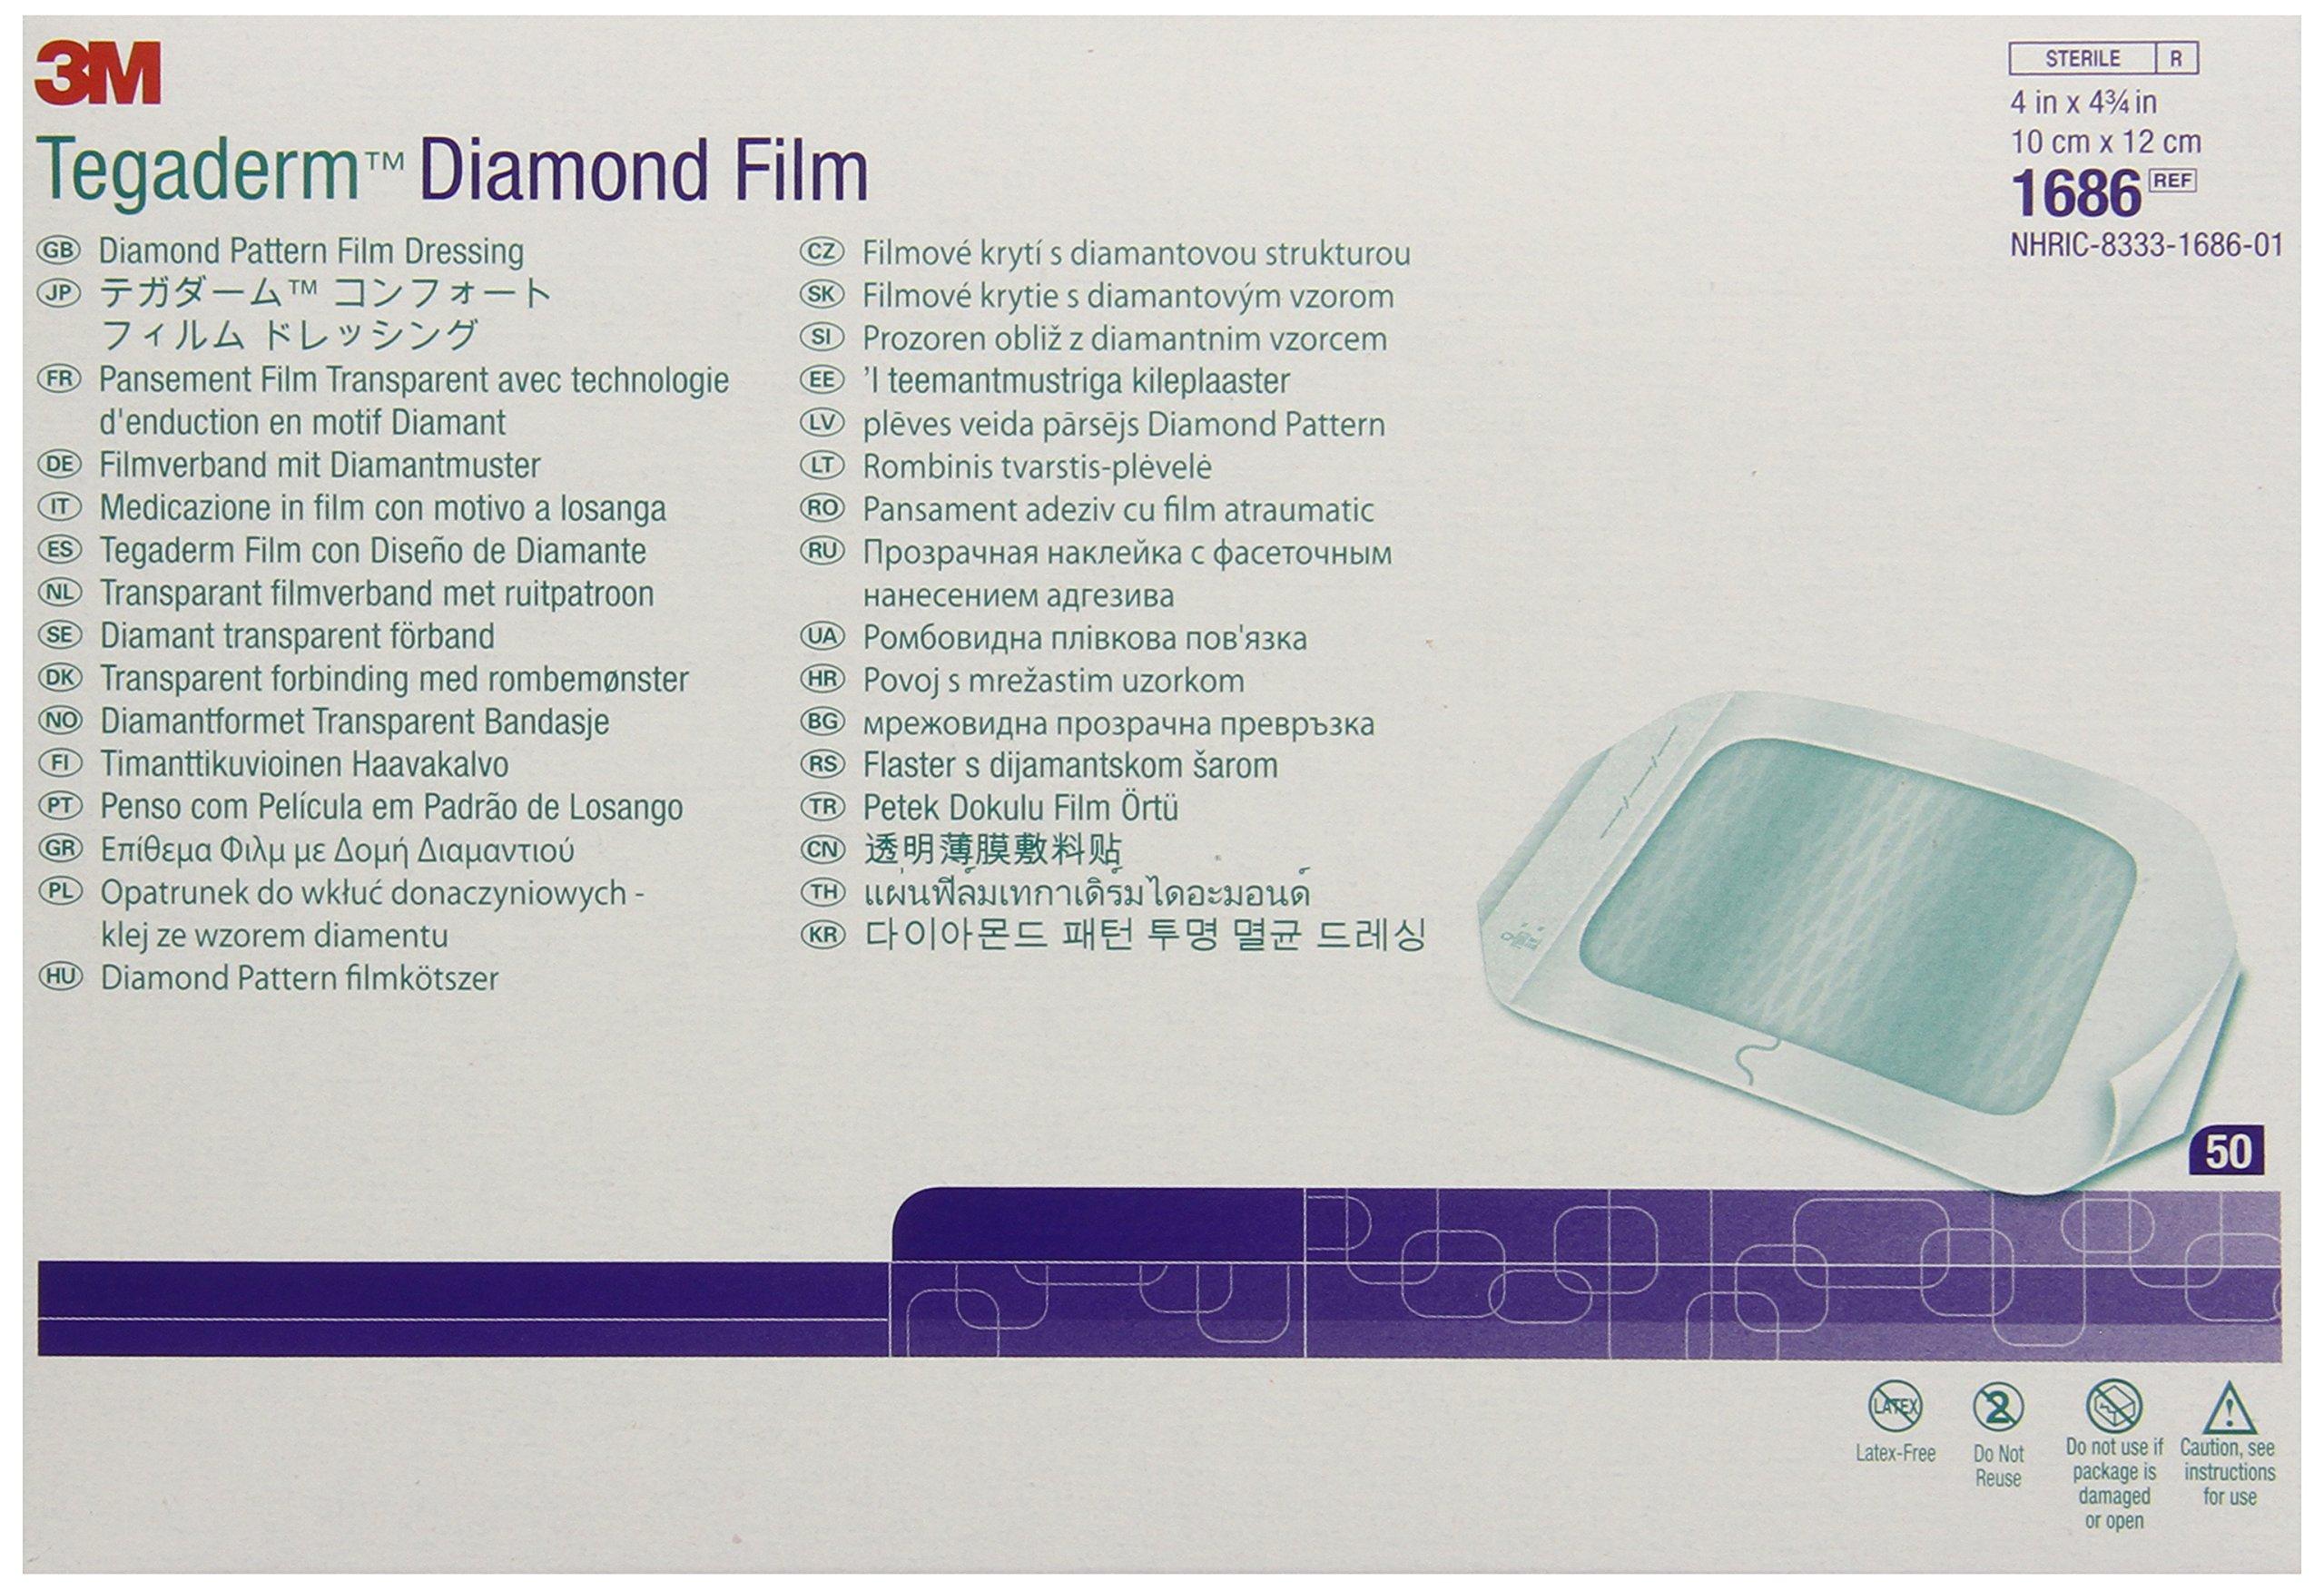 3M Tegaderm Diamond Pattern Film Dressing 1686 (Pack of 200)